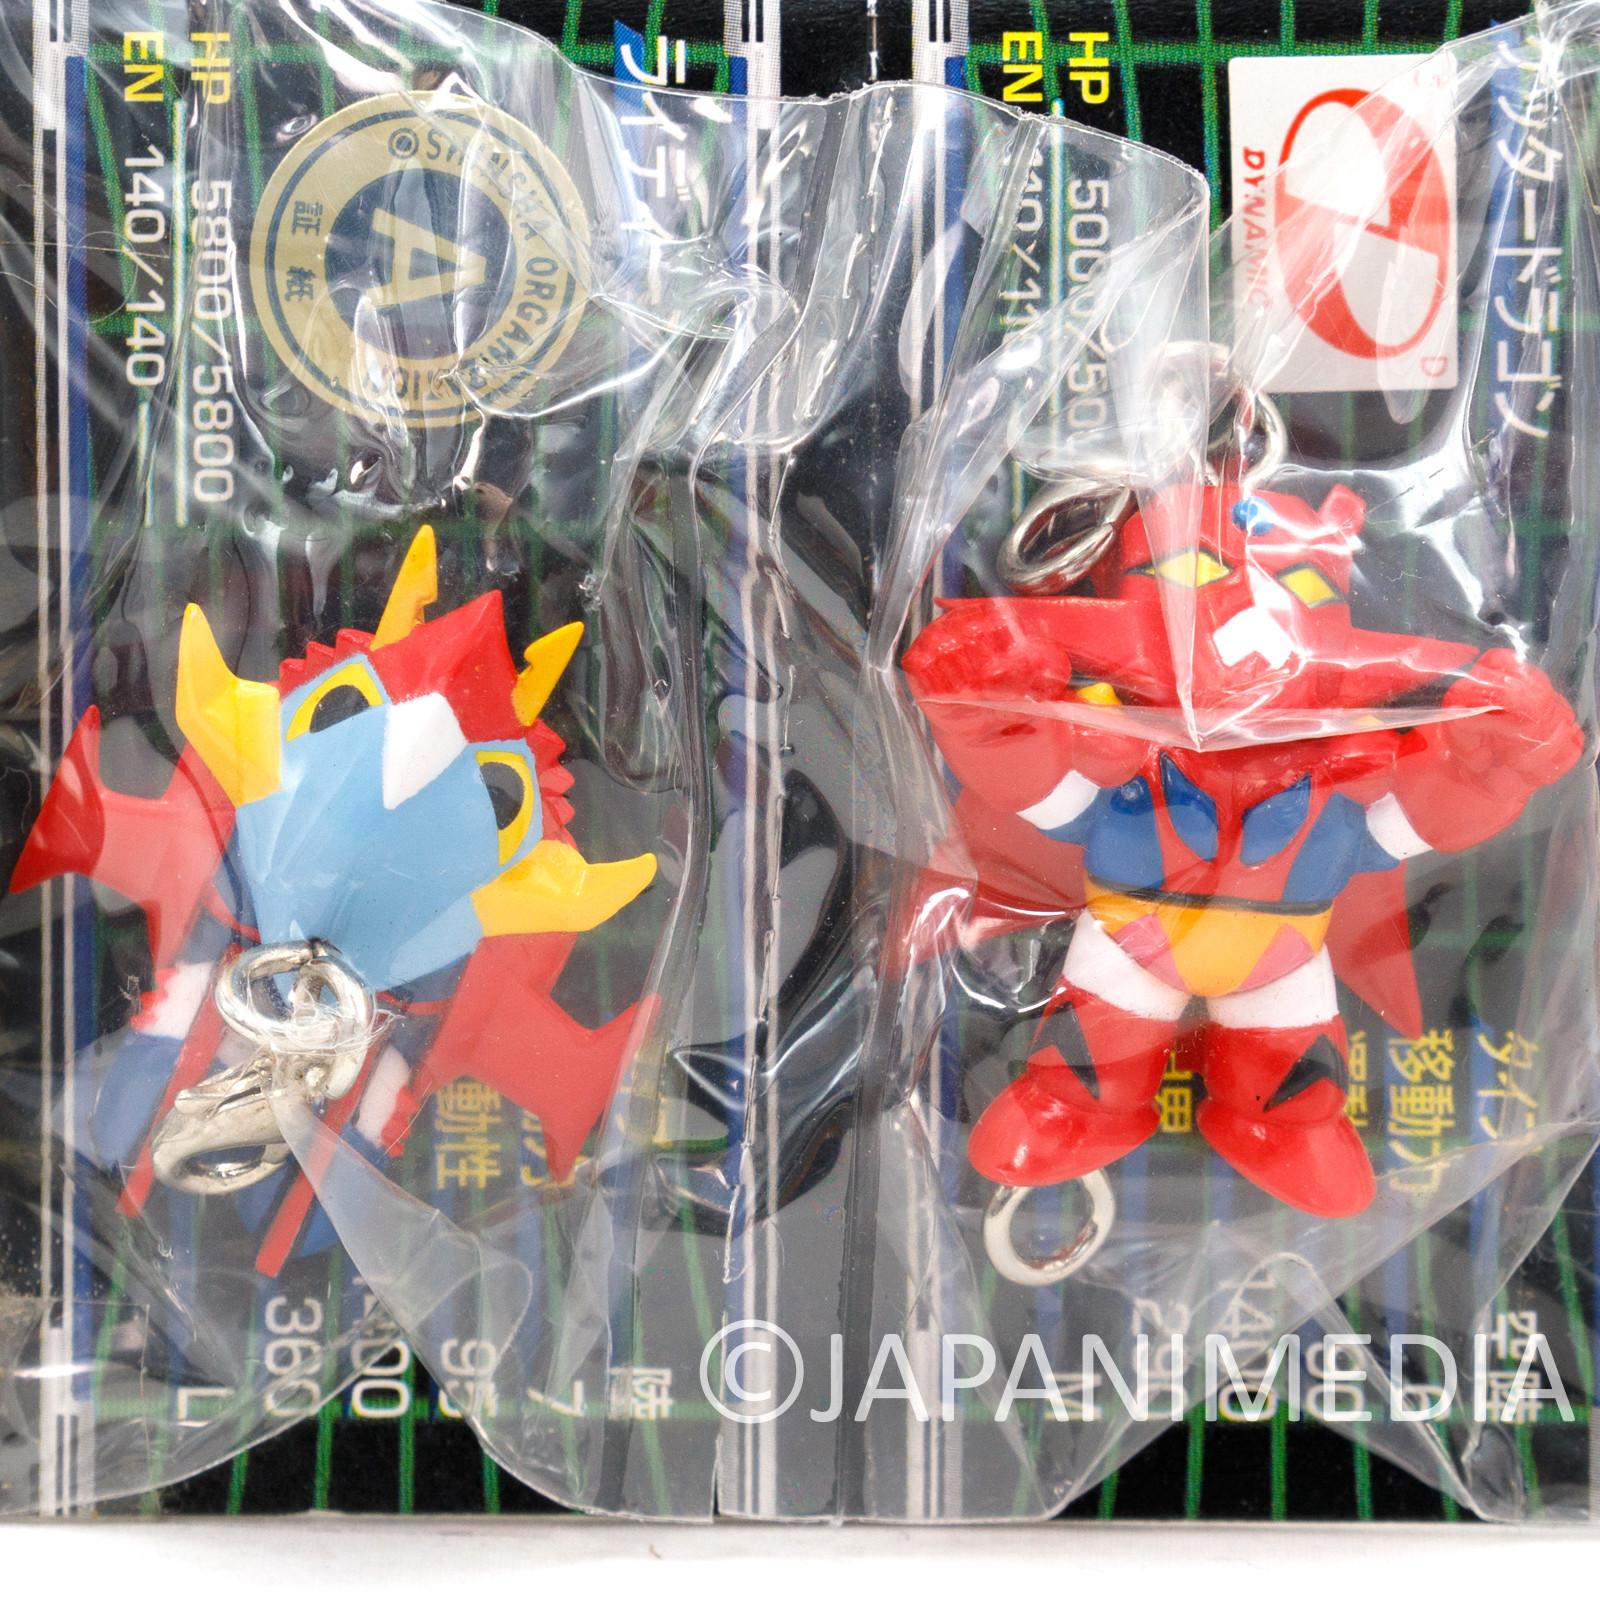 Getter Dragon Robo & Reideen God Bird Mascot Figure Charm Banpresto JAPAN